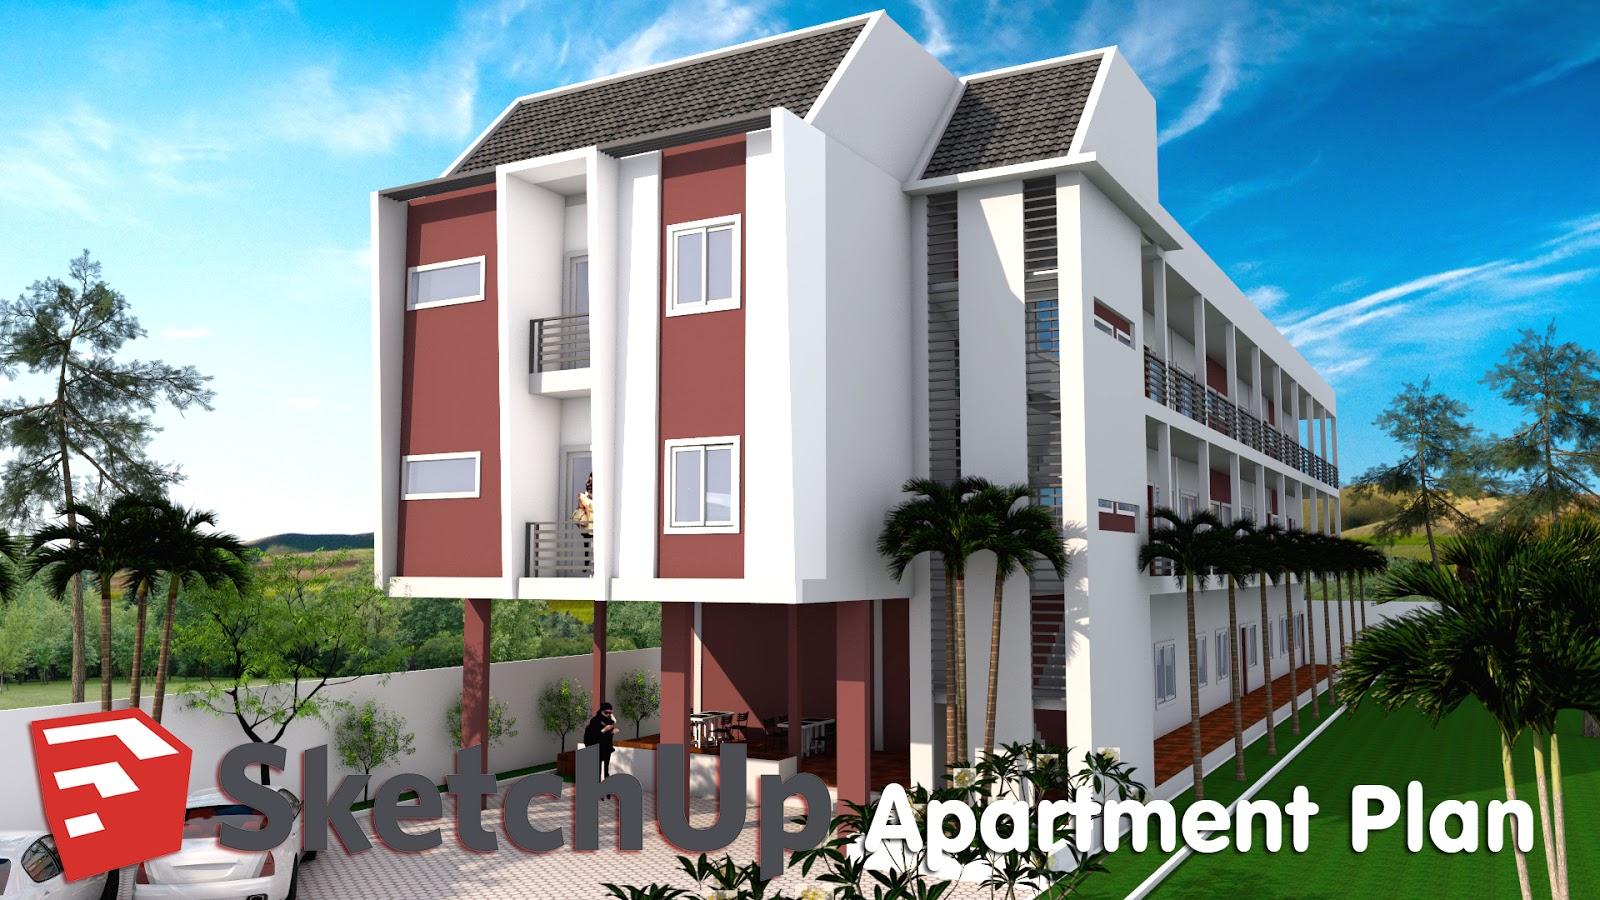 Sketchup model apartment design plan a01 ma house plan for Apartment model house